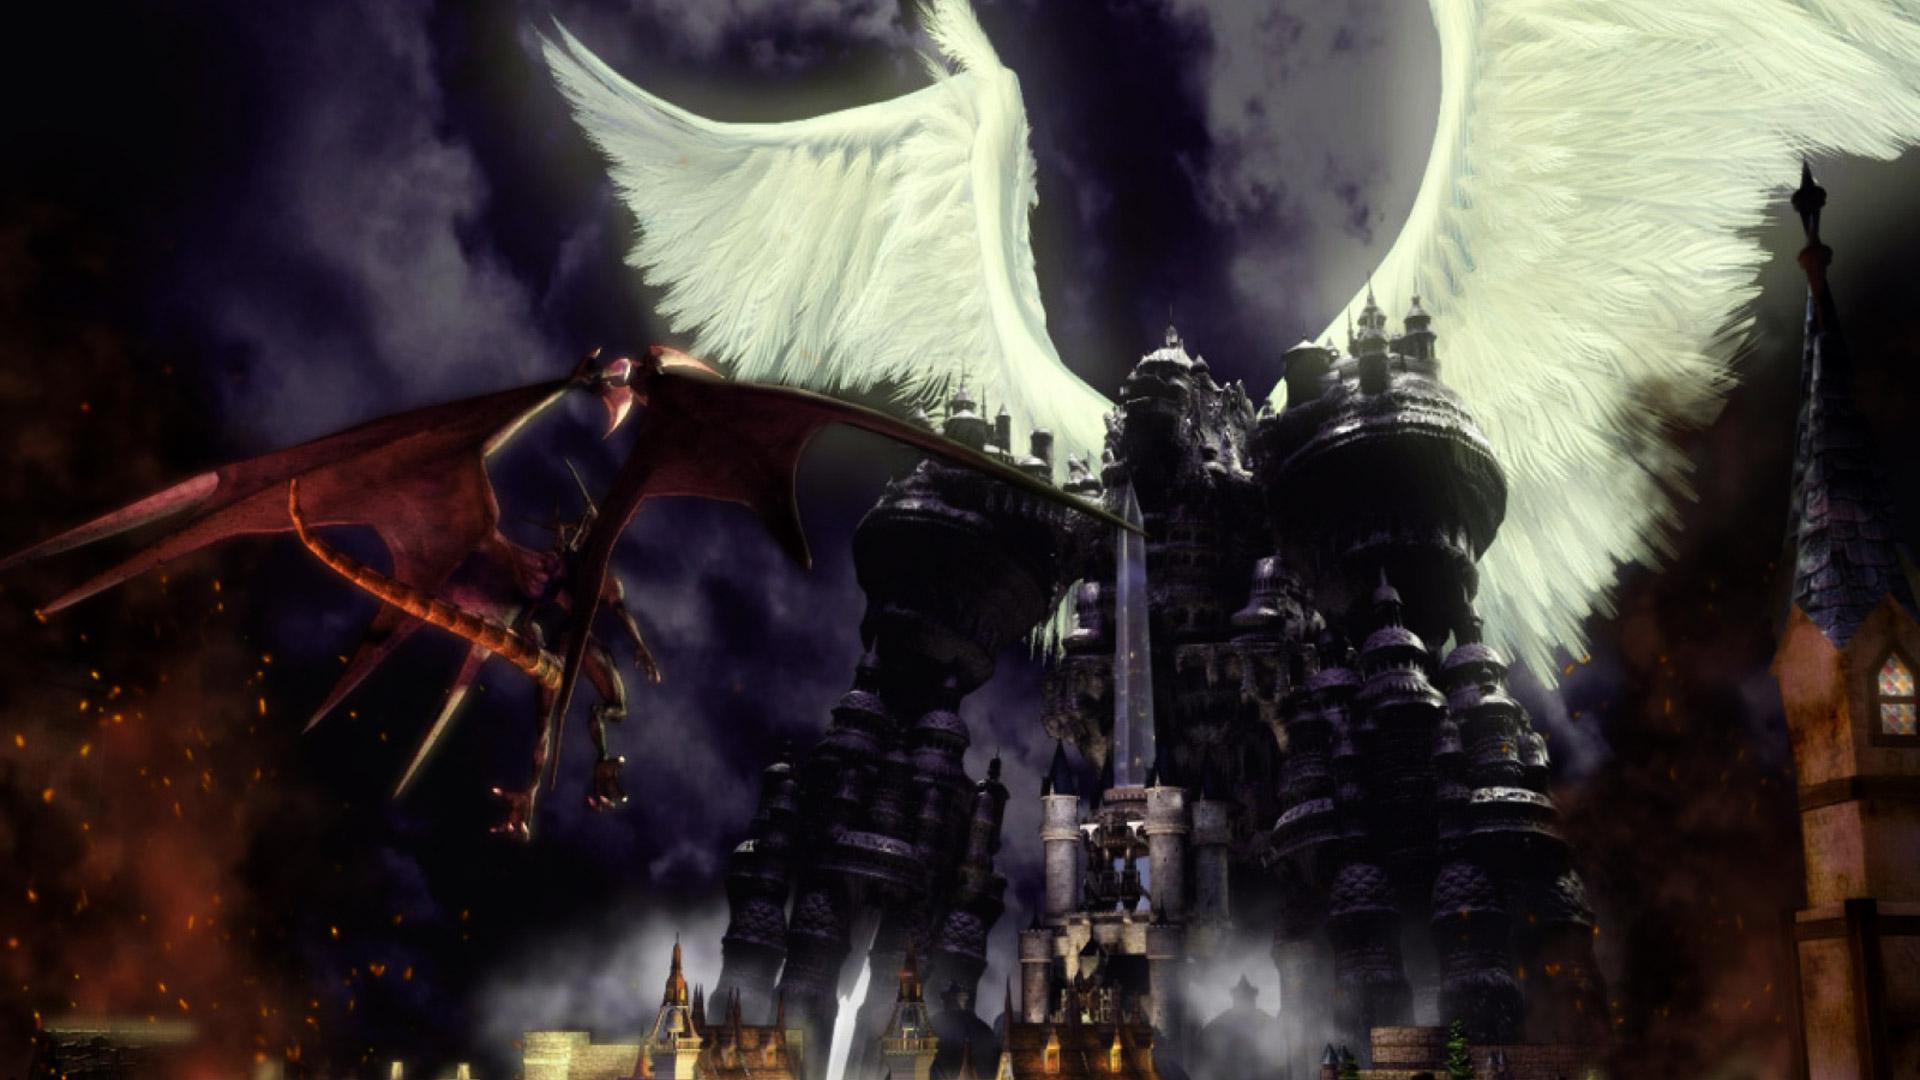 Free Download Final Fantasy Ix Wallpaper In 1920x1080 1920x1080